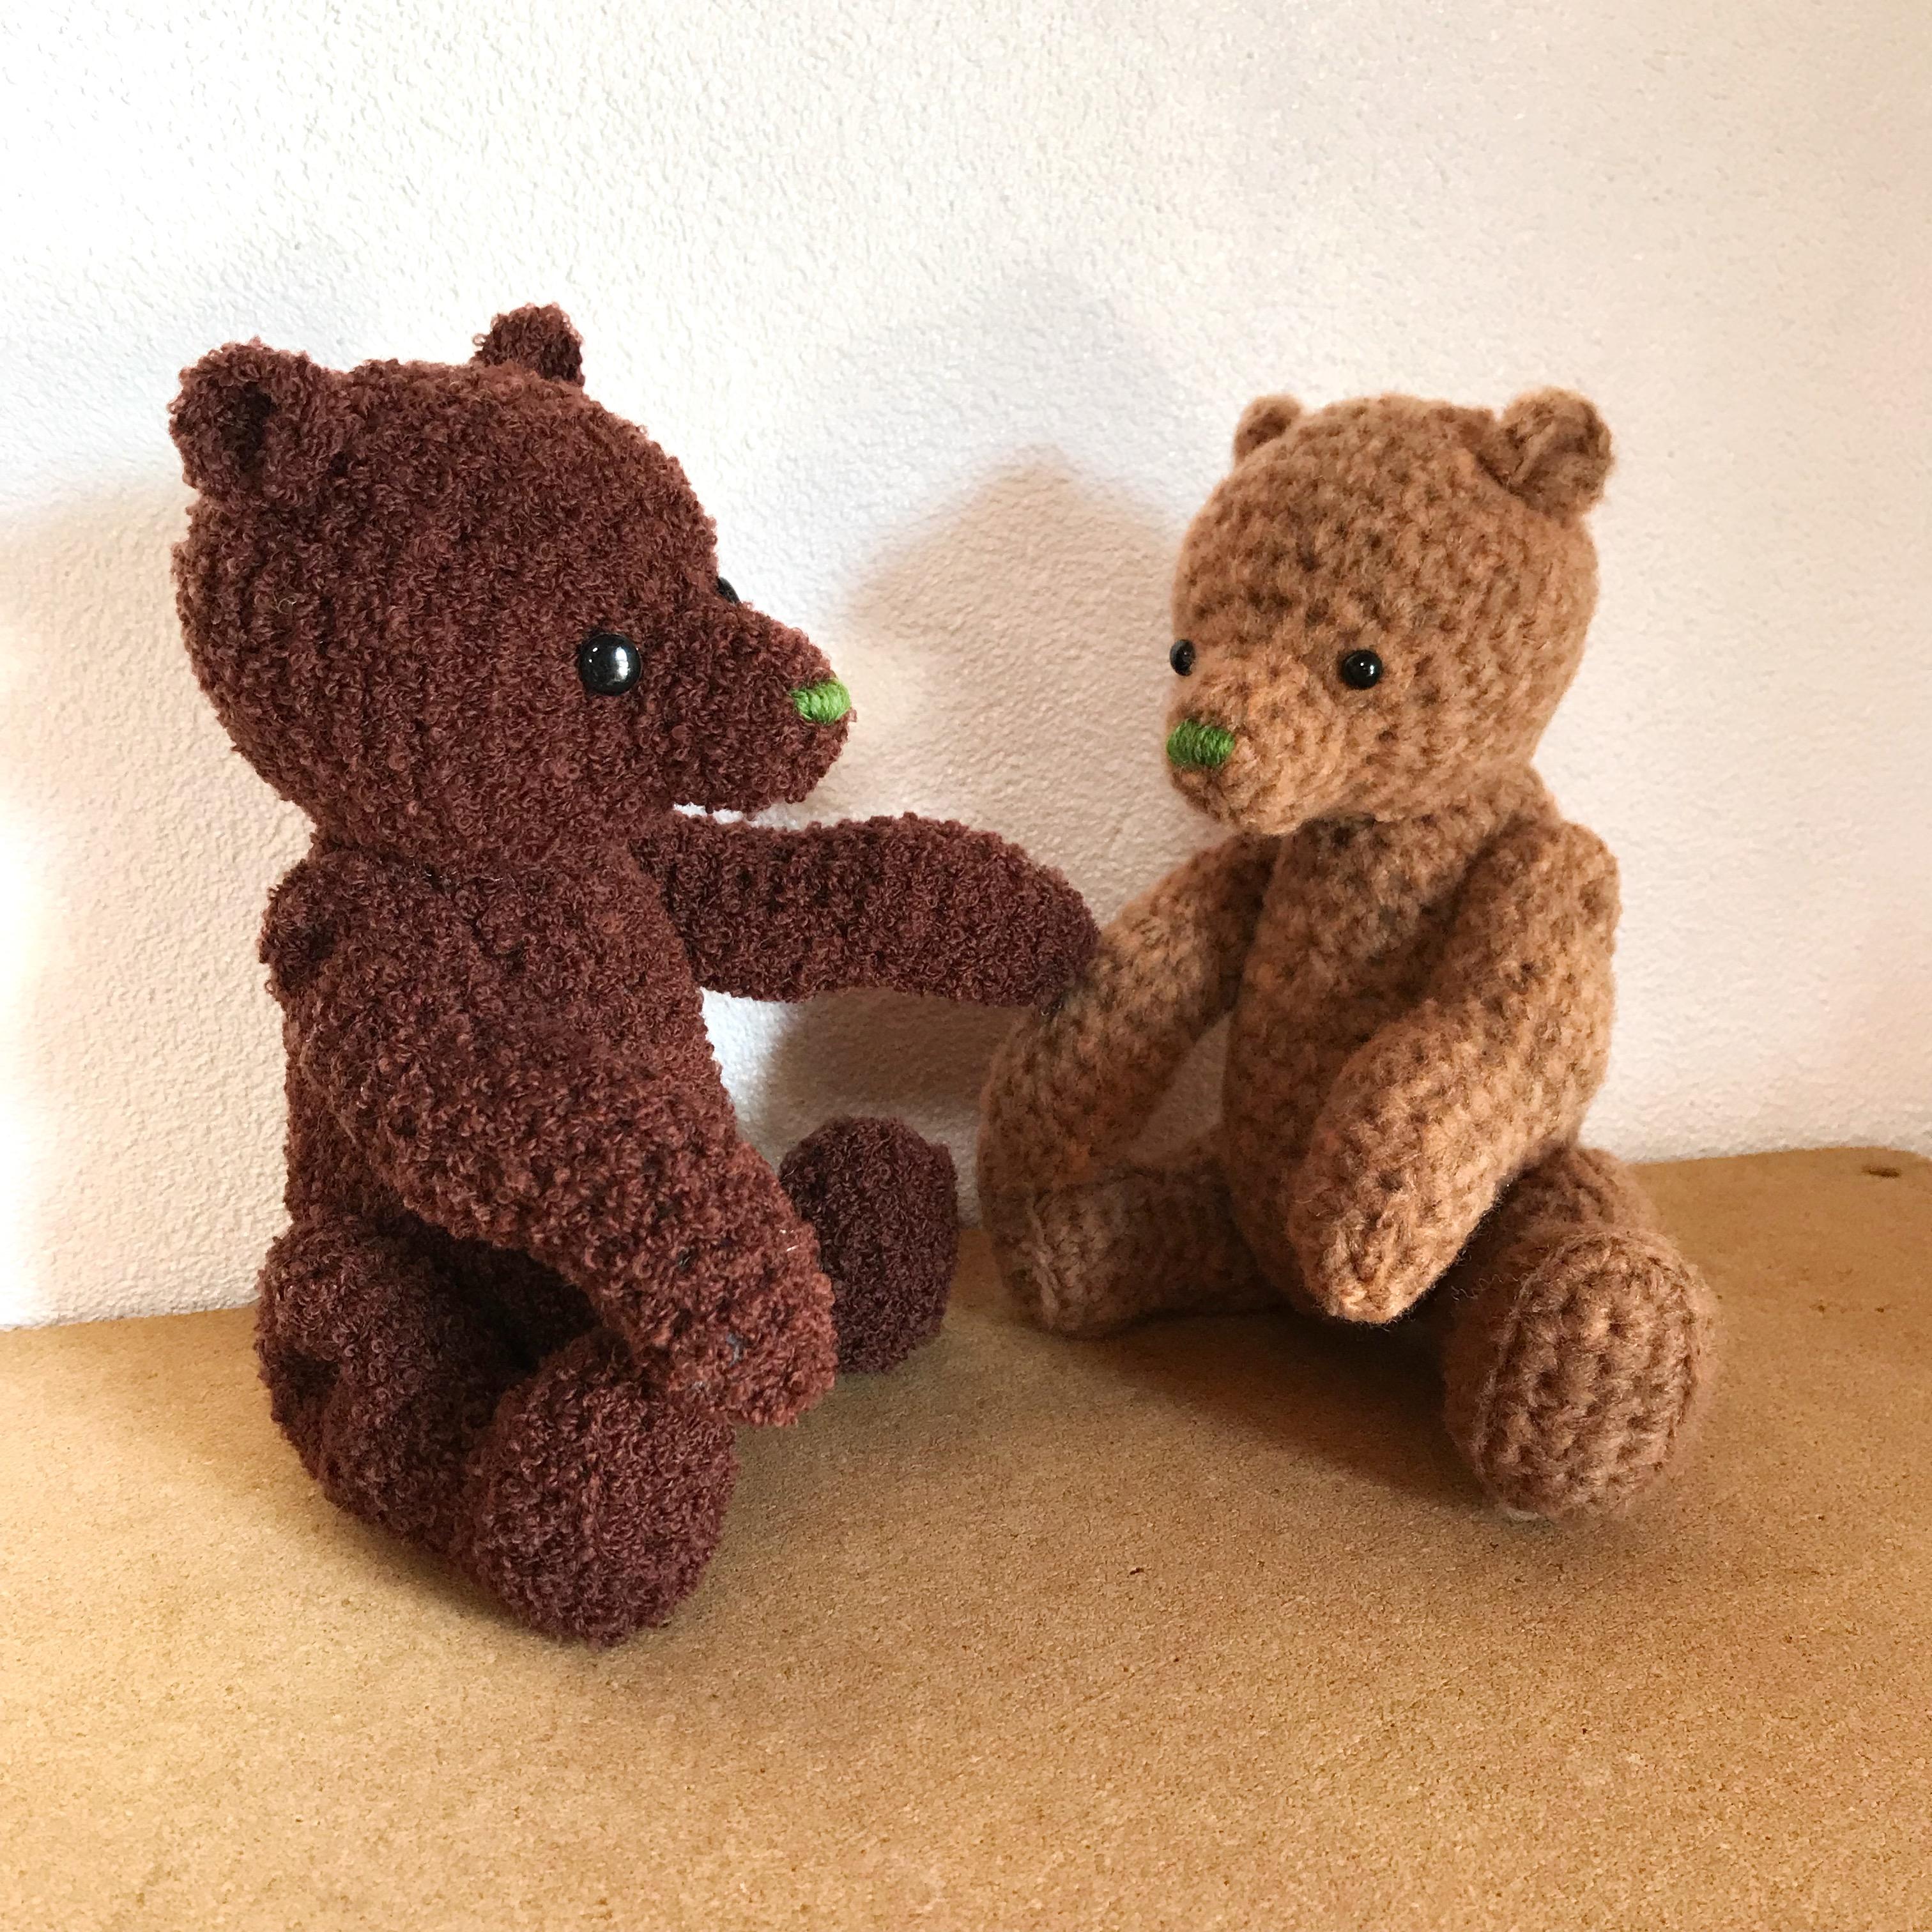 Teddy bear 03 amigurumi pattern 03 teddy bear 03 amigurumi pattern 03 voltagebd Gallery